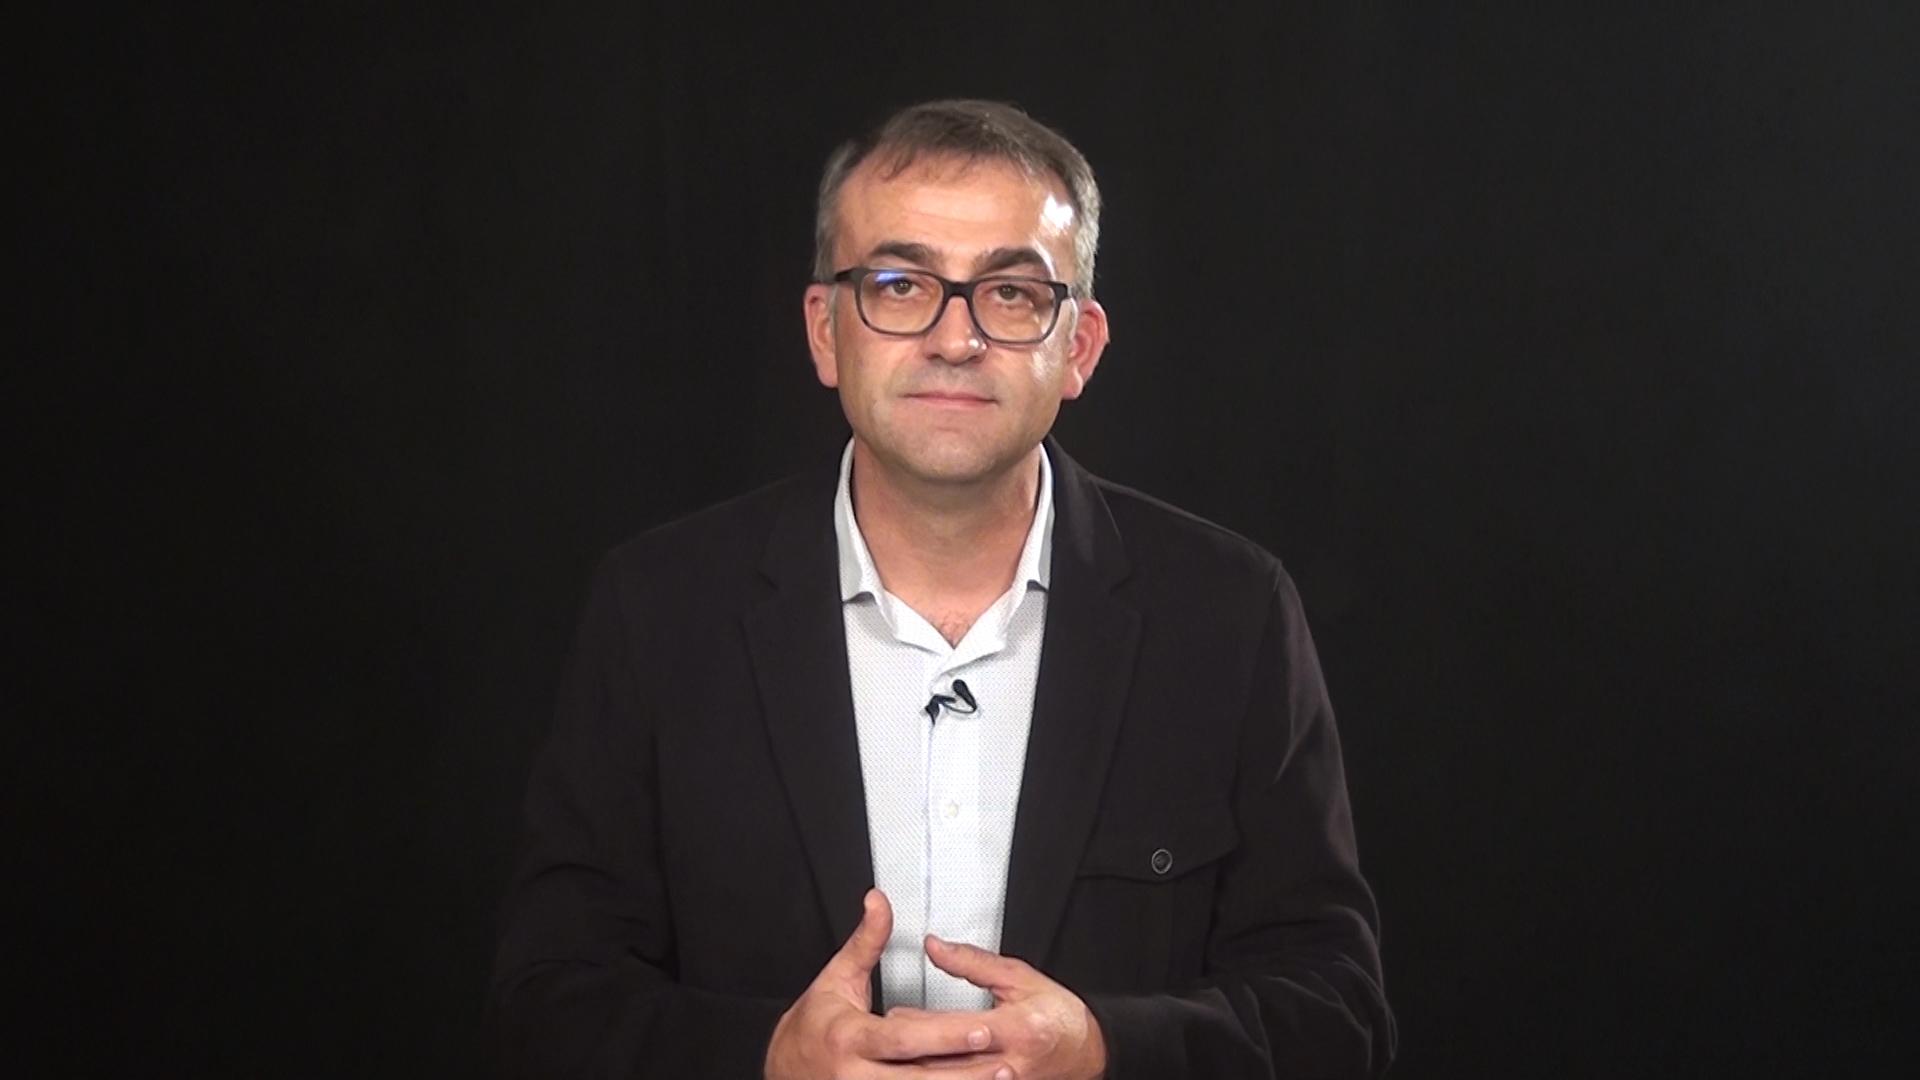 Raúl Moral